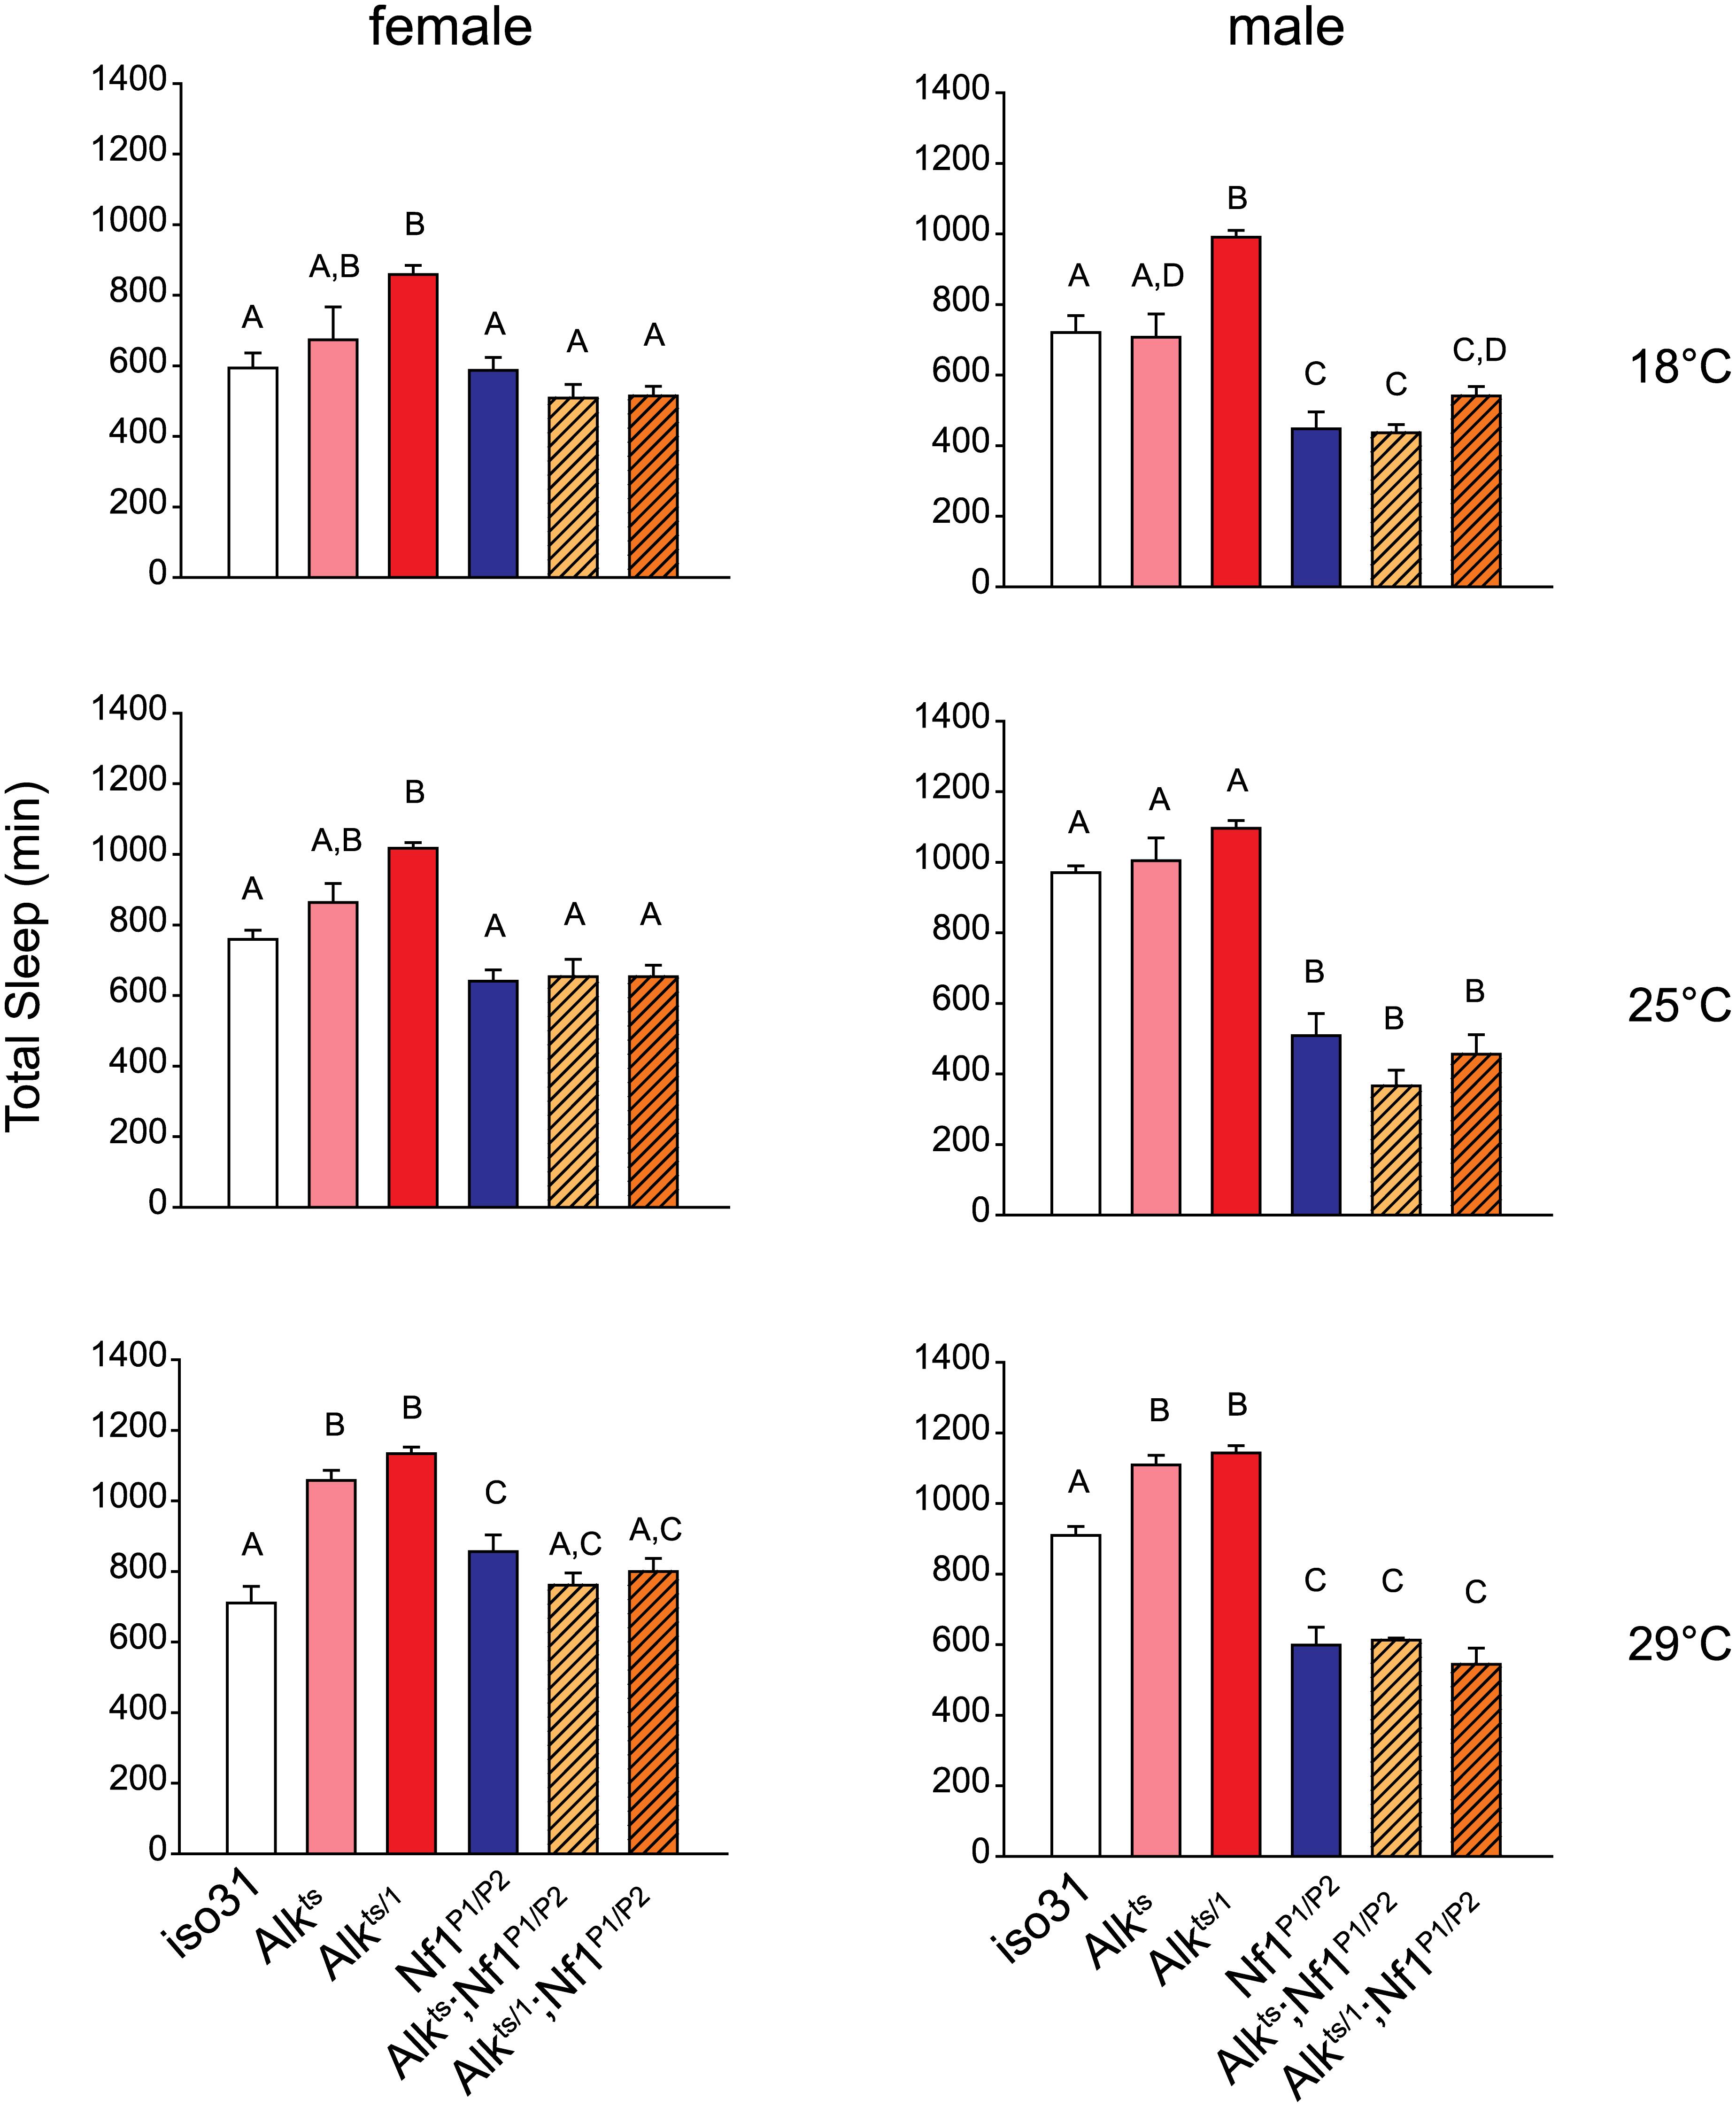 <i>Nf1</i> mutations suppress the long-sleep phenotype of <i>Alk</i> mutants.